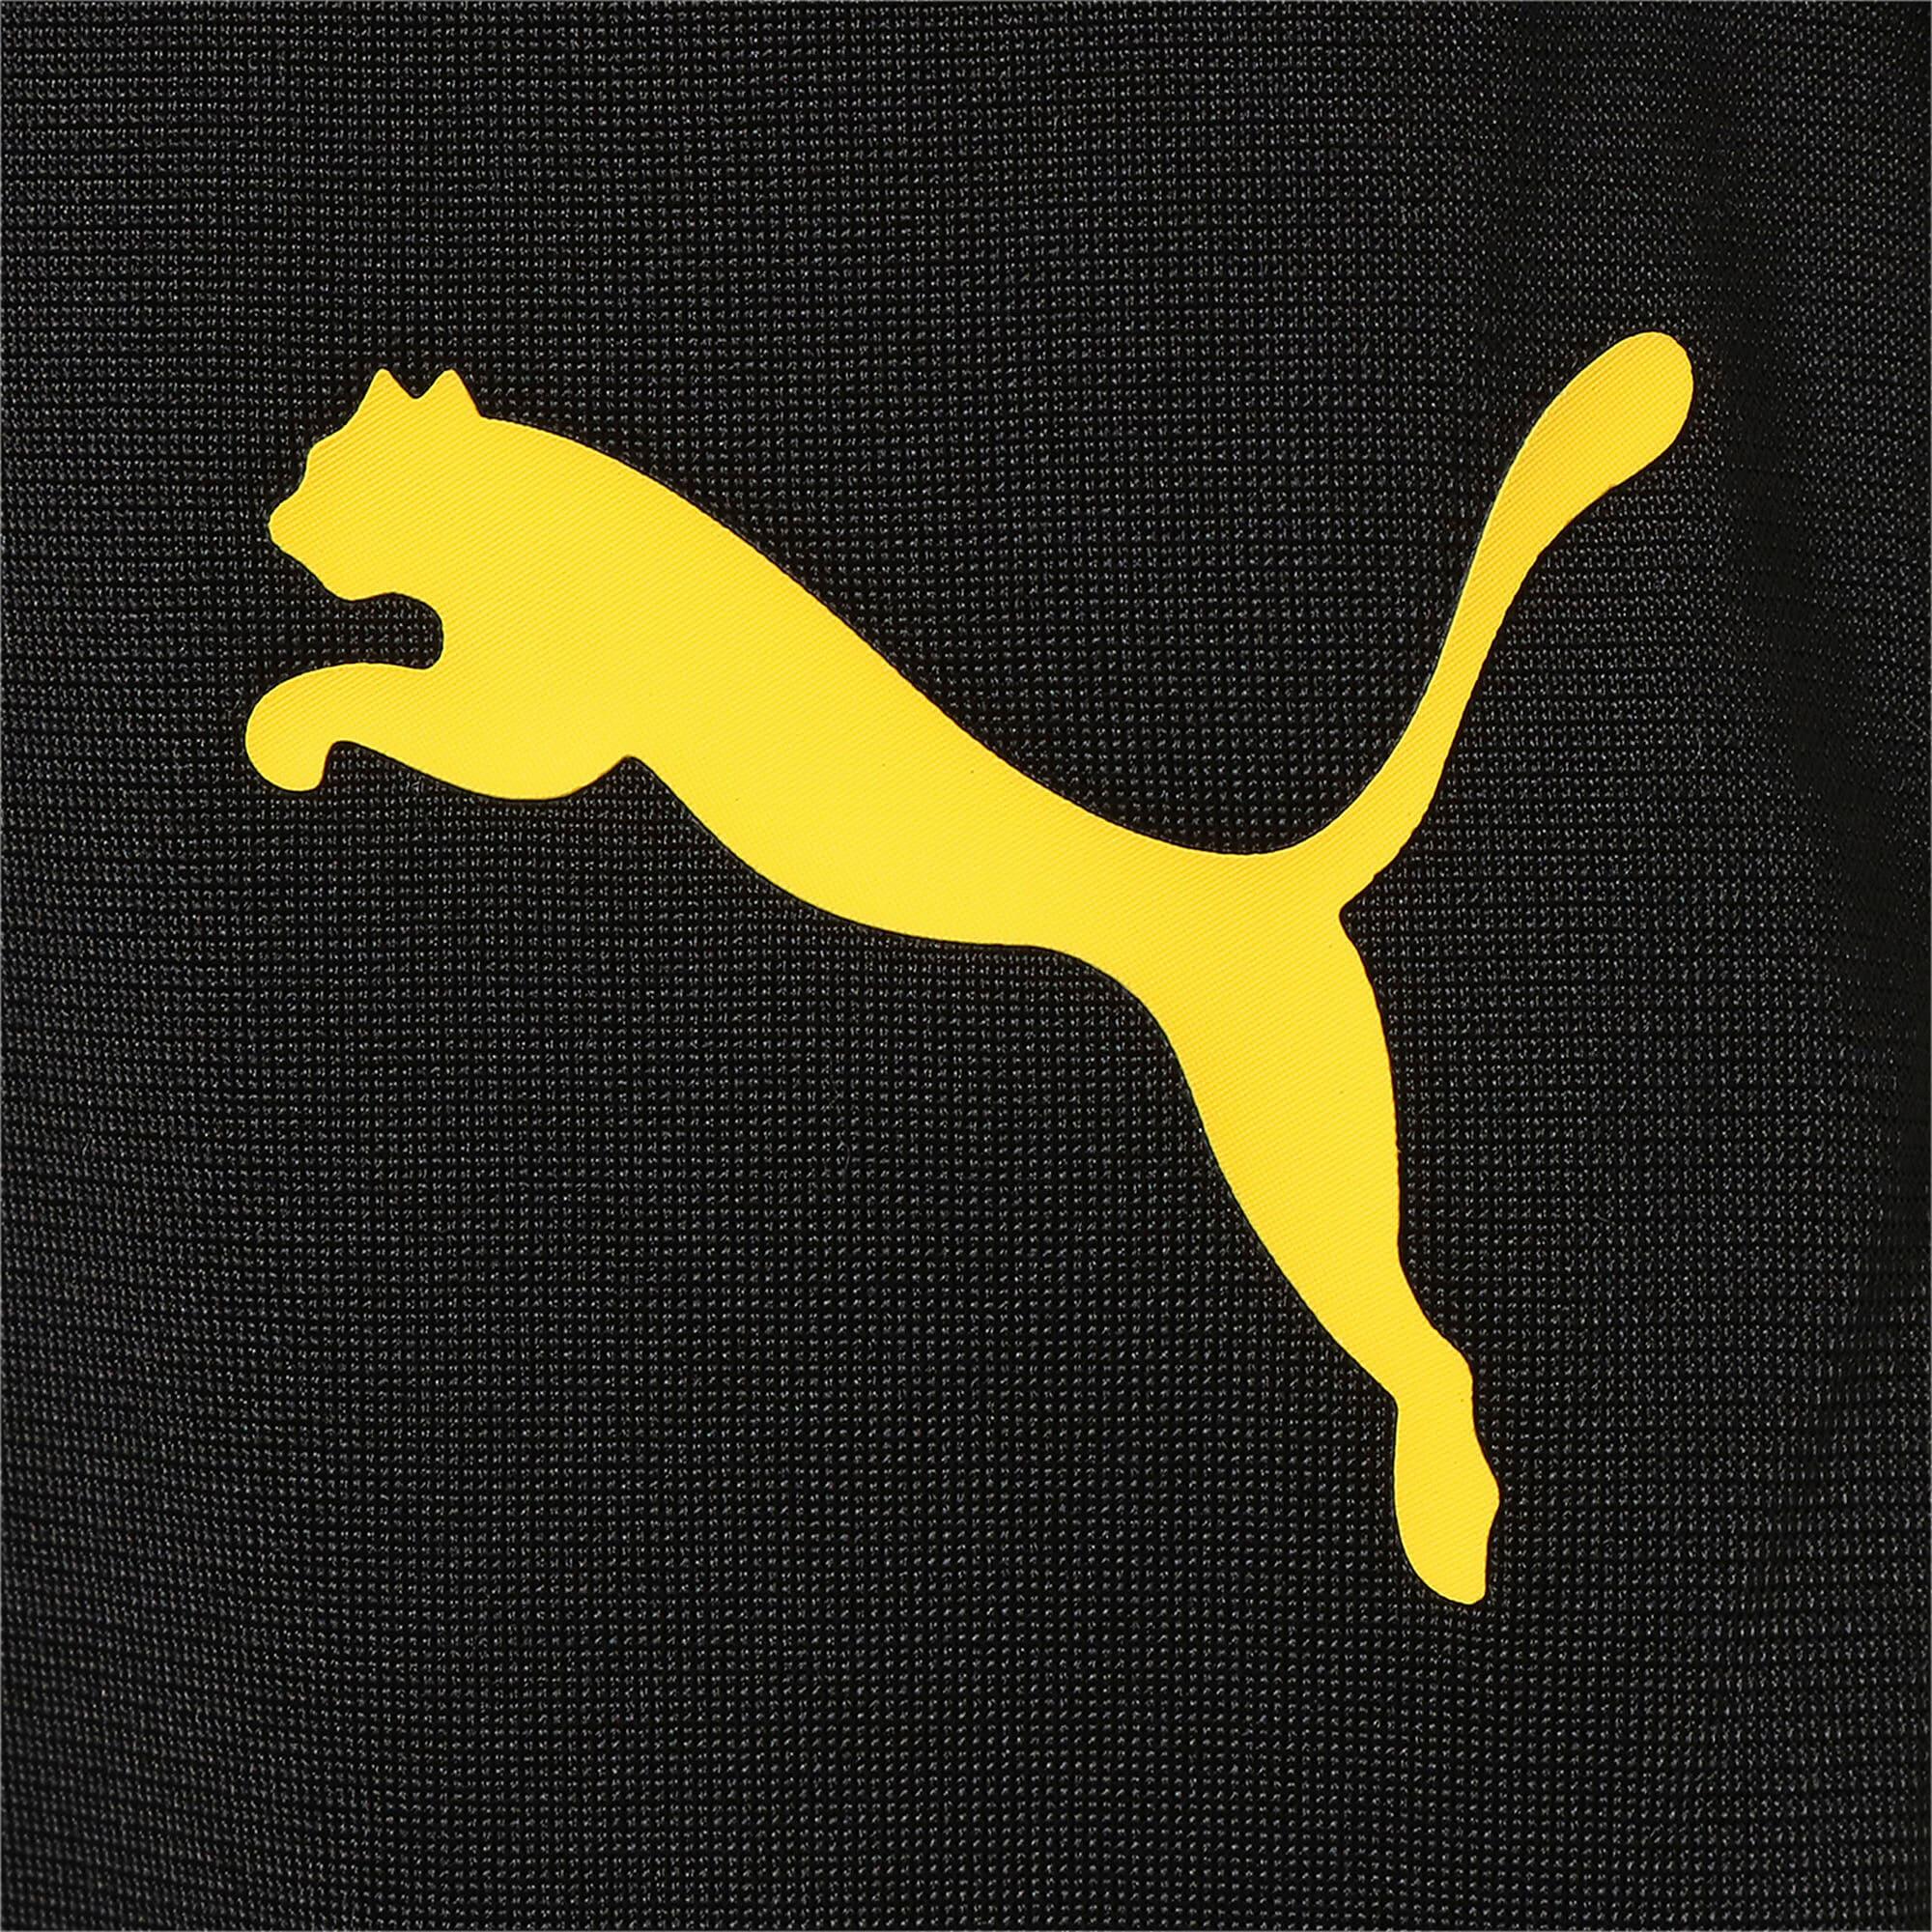 Thumbnail 7 of ドルトムント BVB トレーニング パンツ, Puma Black-Cyber Yellow, medium-JPN